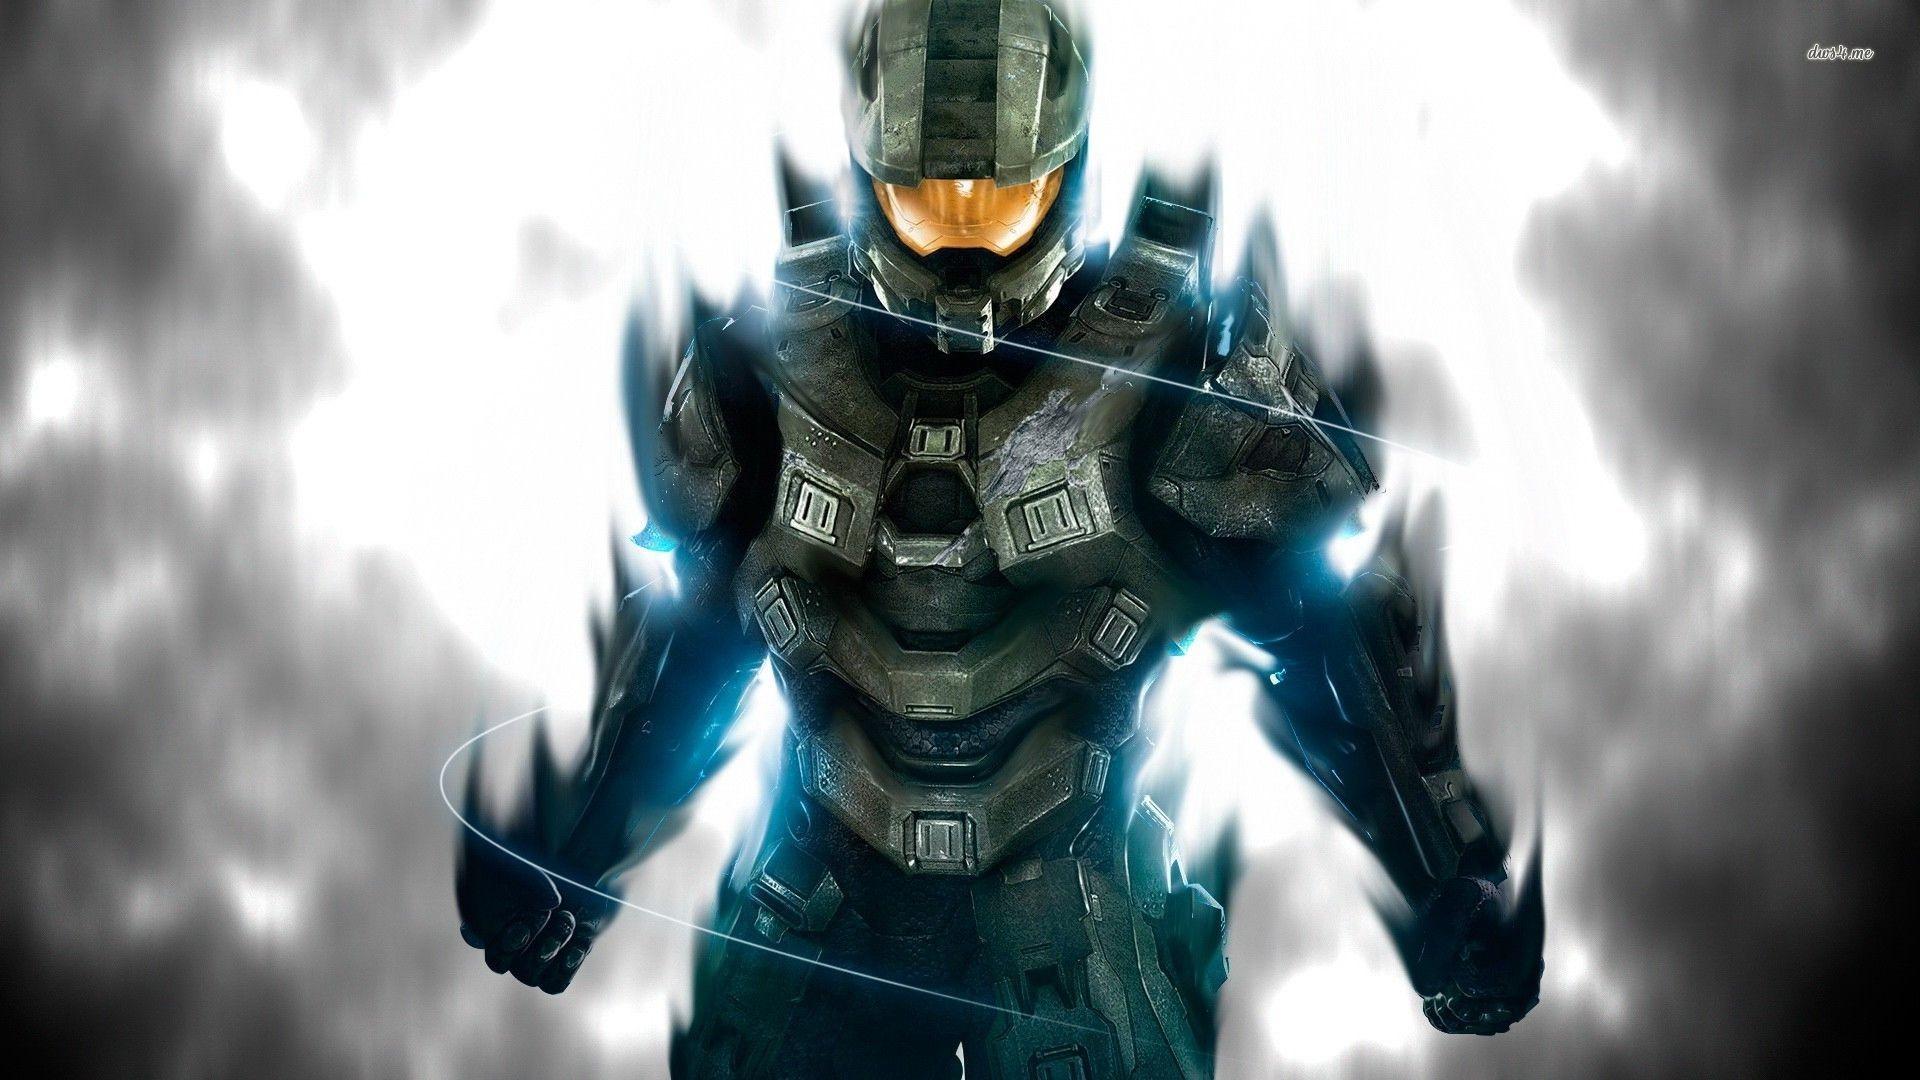 Master Chief – Halo 4 wallpaper 1280×800 Master Chief – Halo 4 .